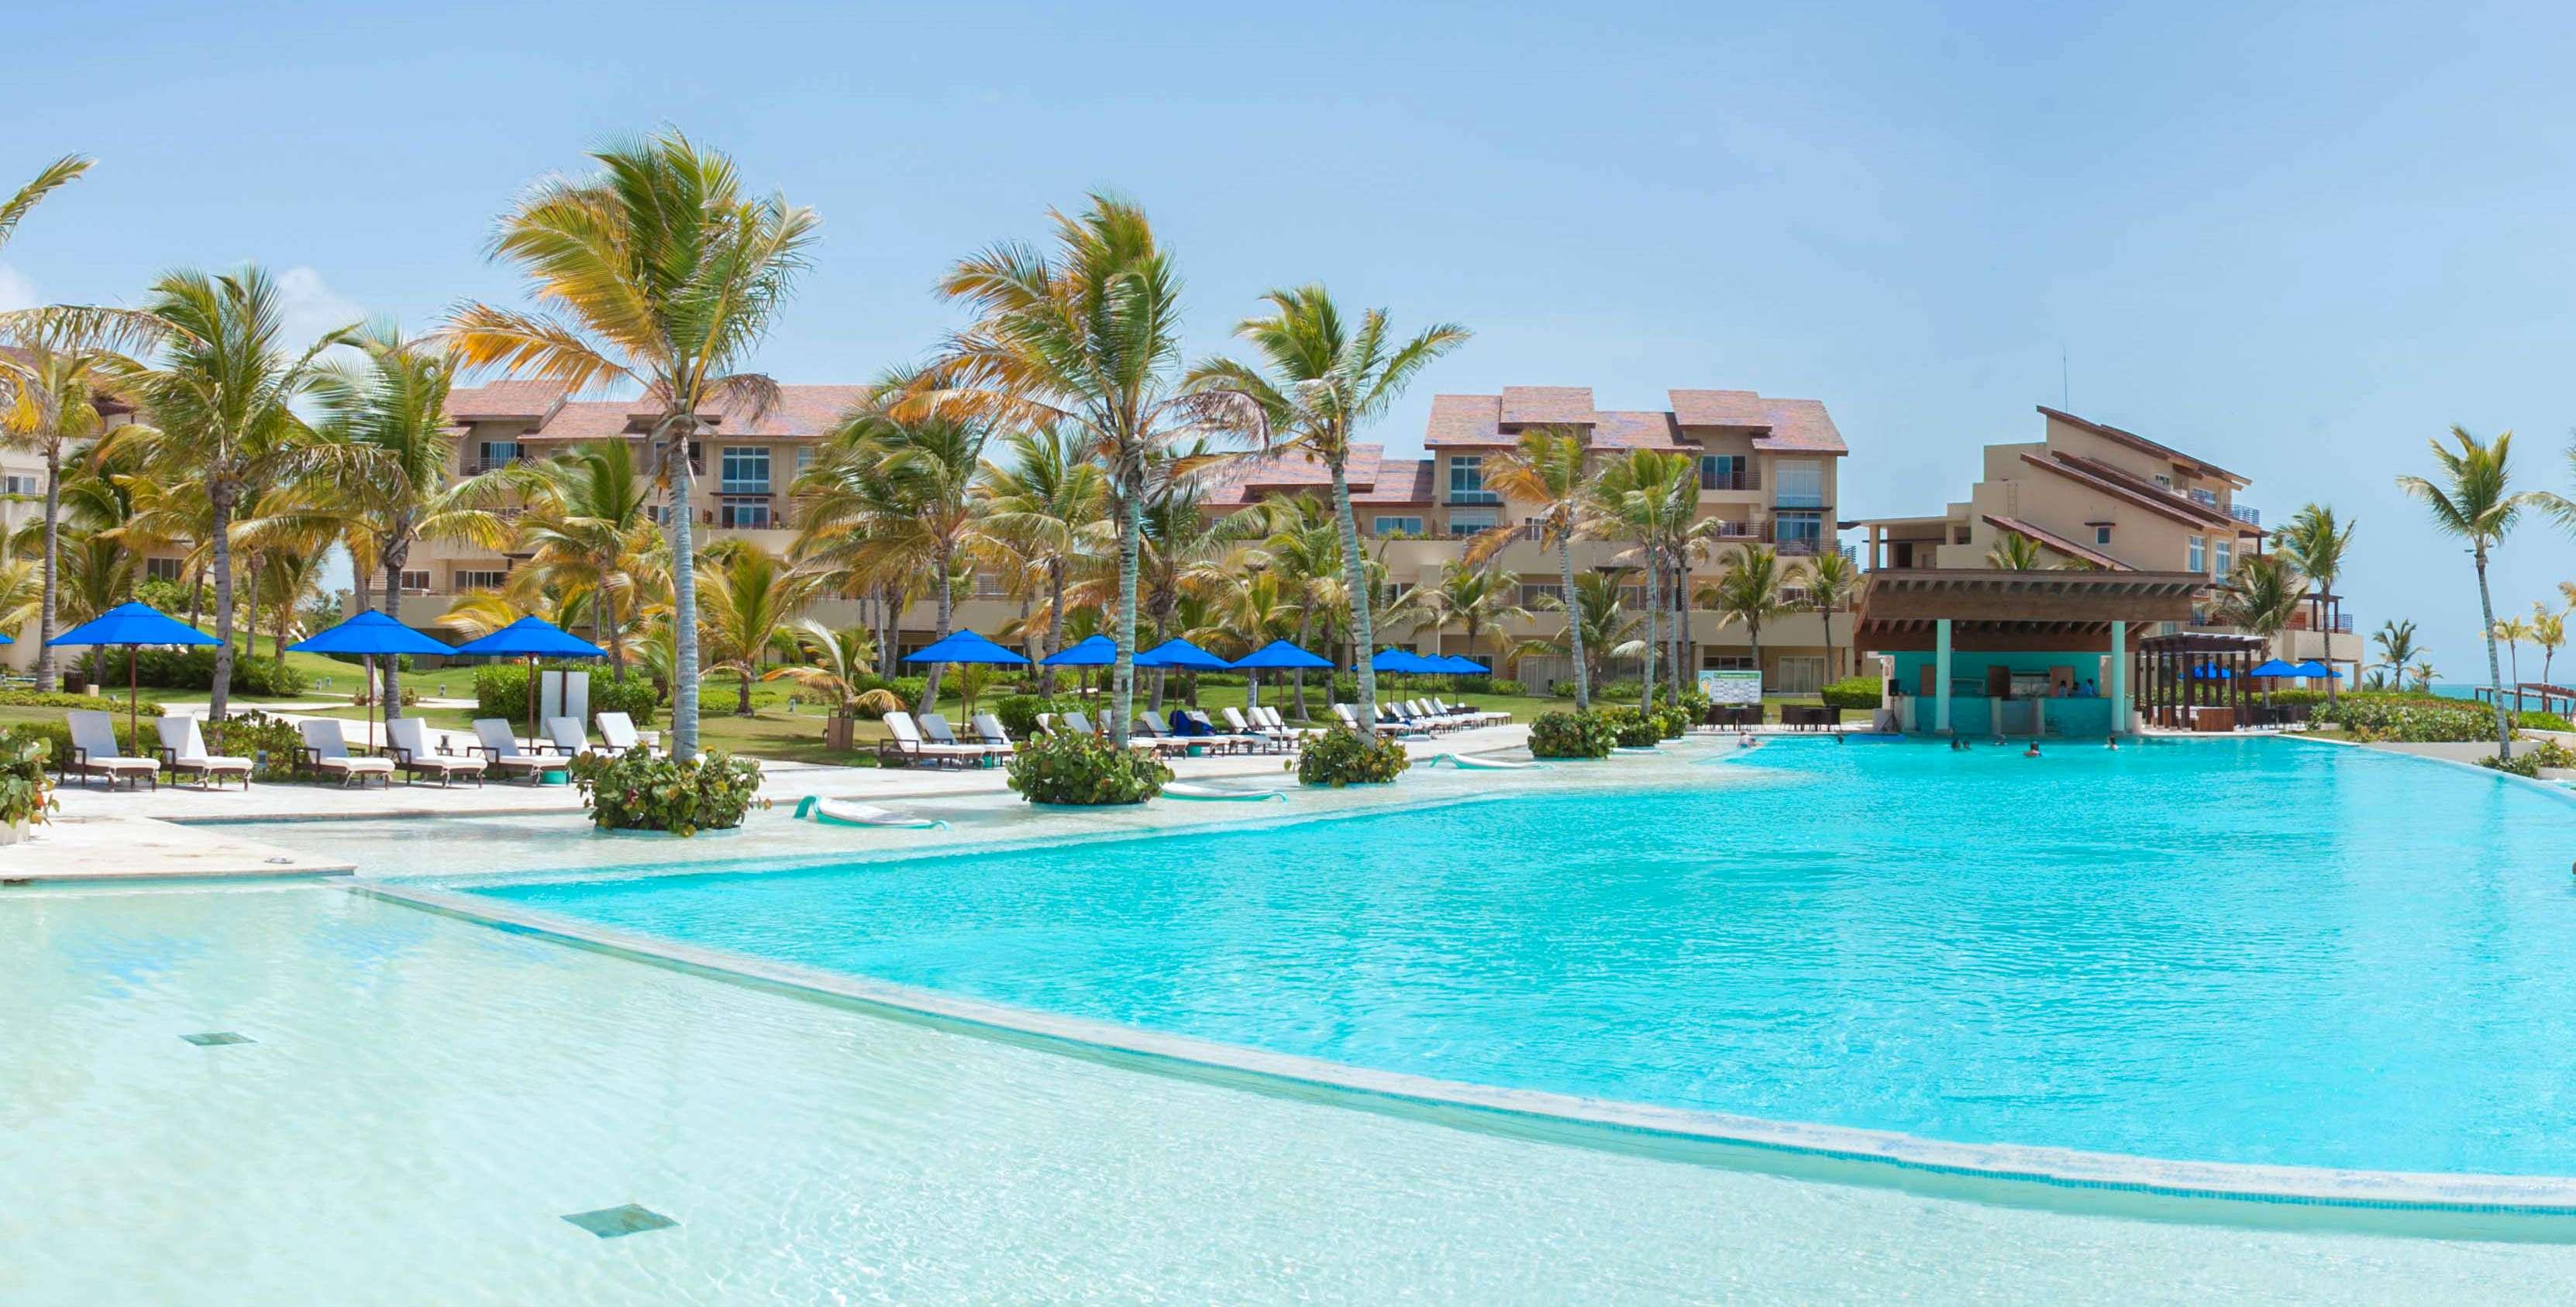 Del Mar by Joy Resorts, Punta Cana, Dom Rep